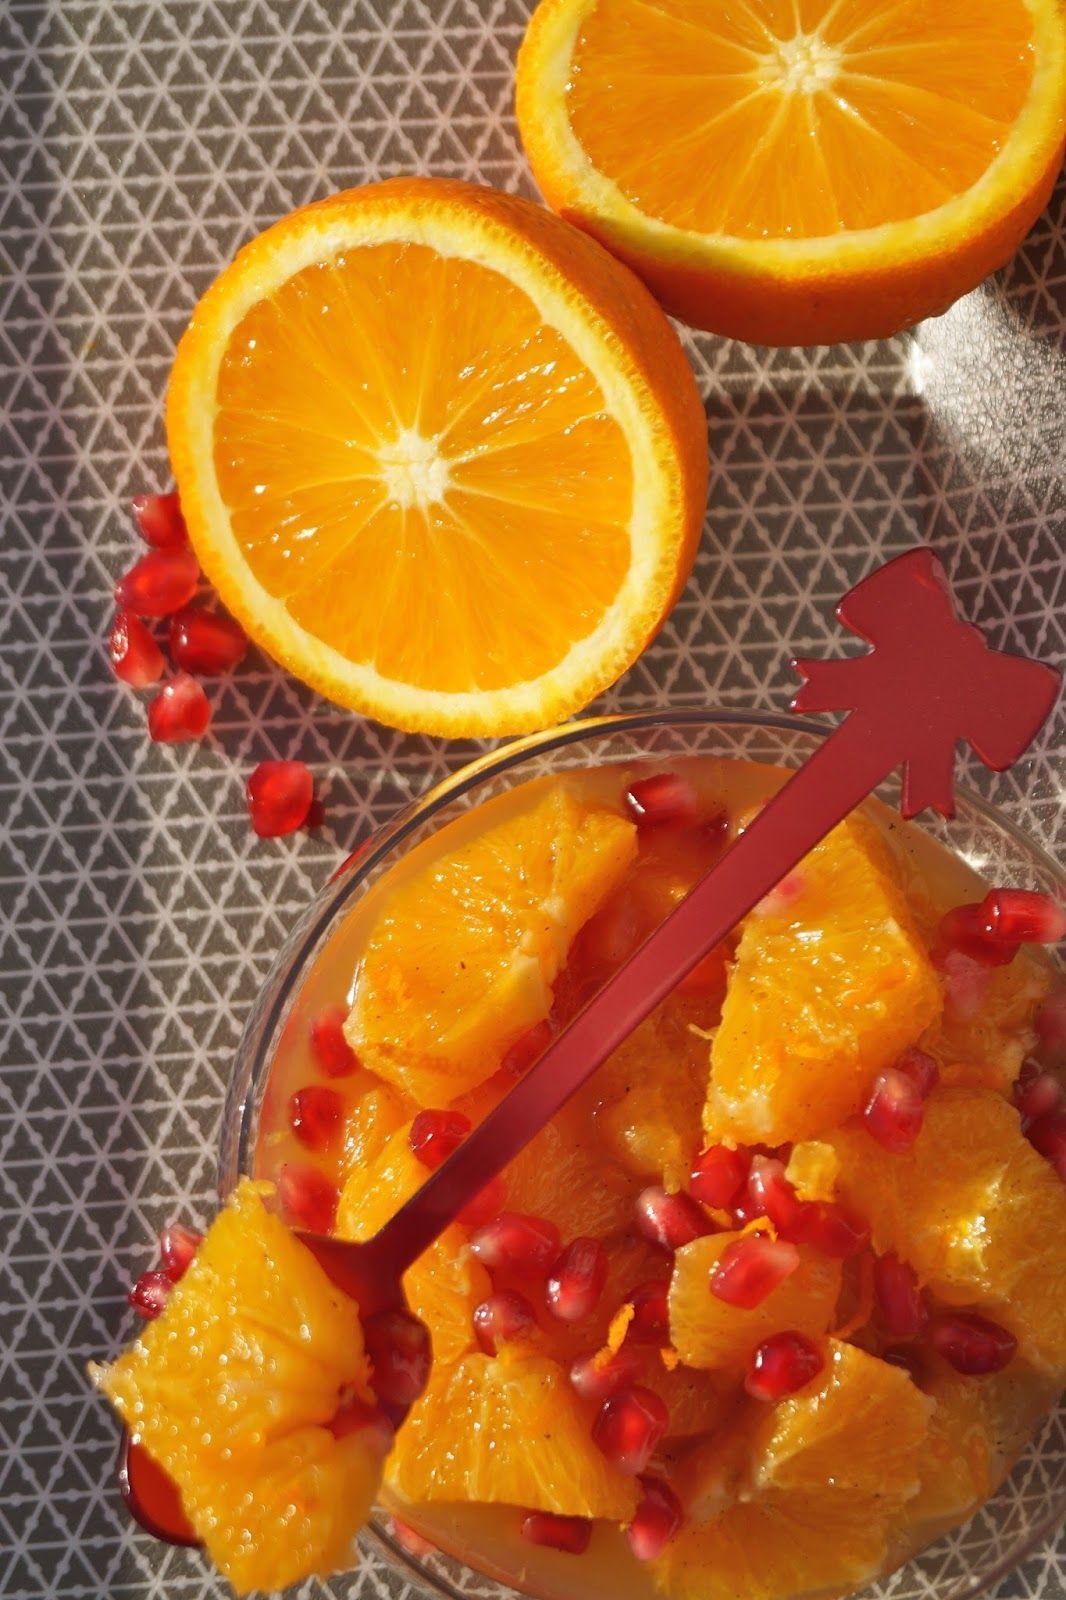 Recettes gourmandes by Kélou: Salade d'oranges et grenade